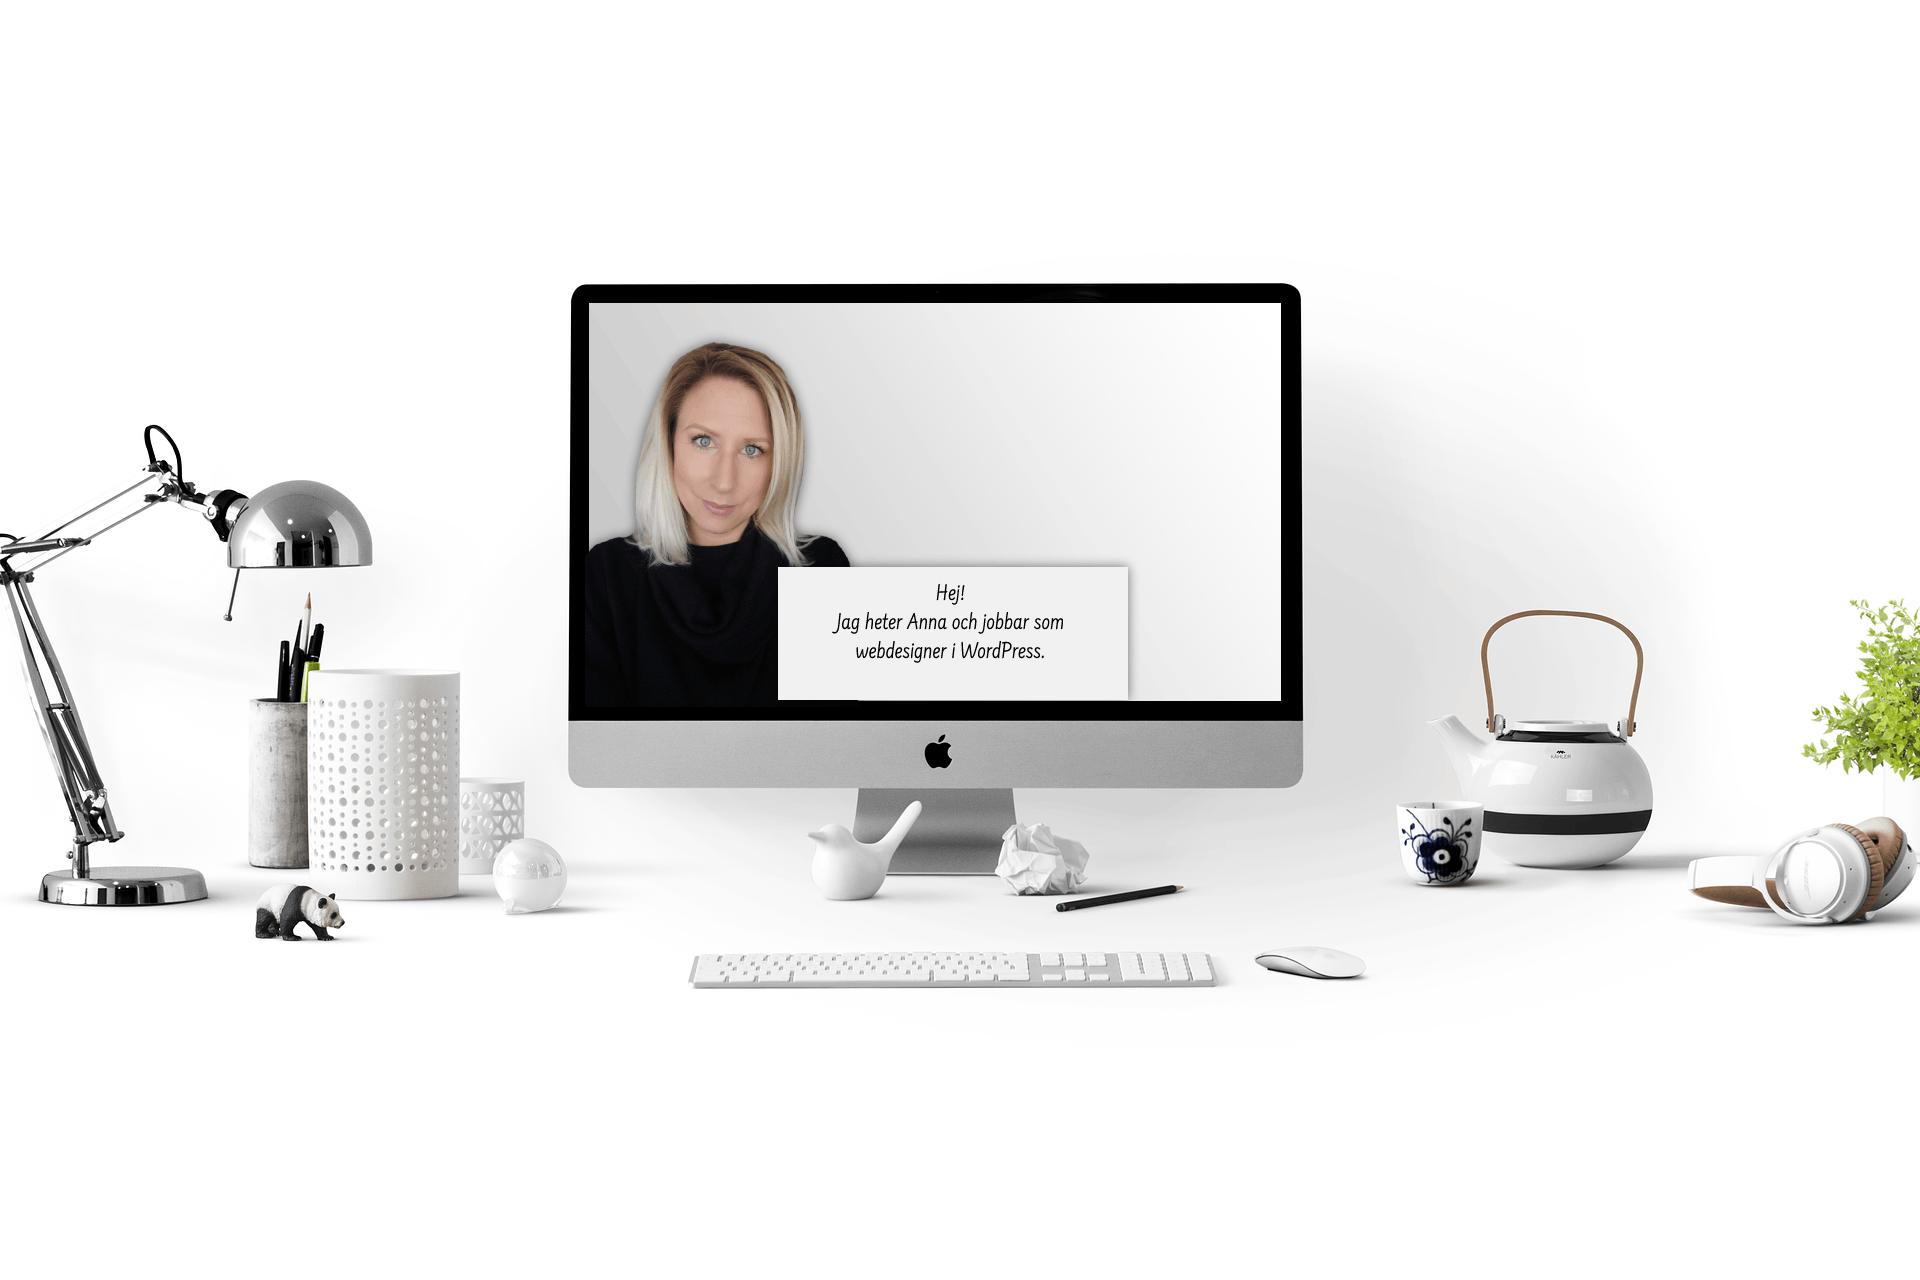 anna-bergman-helsingborg-webbdesign-webdesigner-hemsida